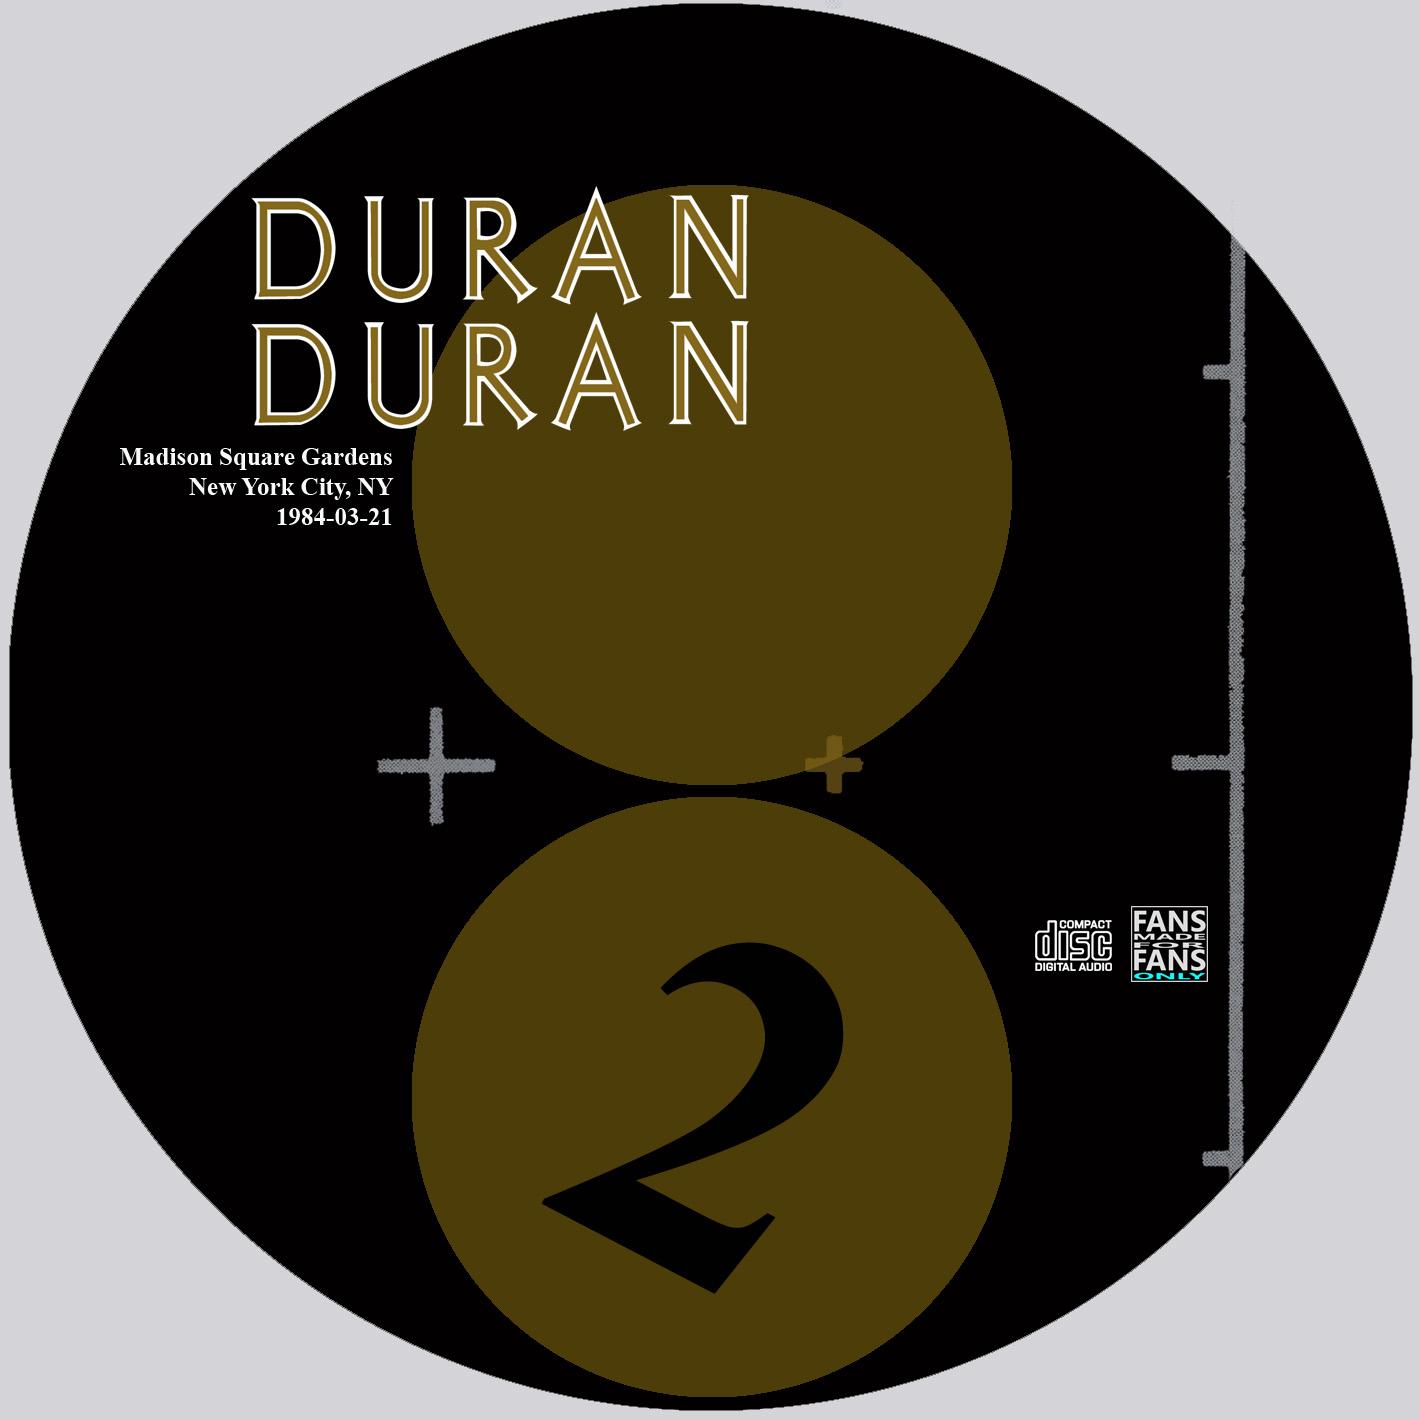 Duran duran forever httpduranduran by romanduran buycottarizona